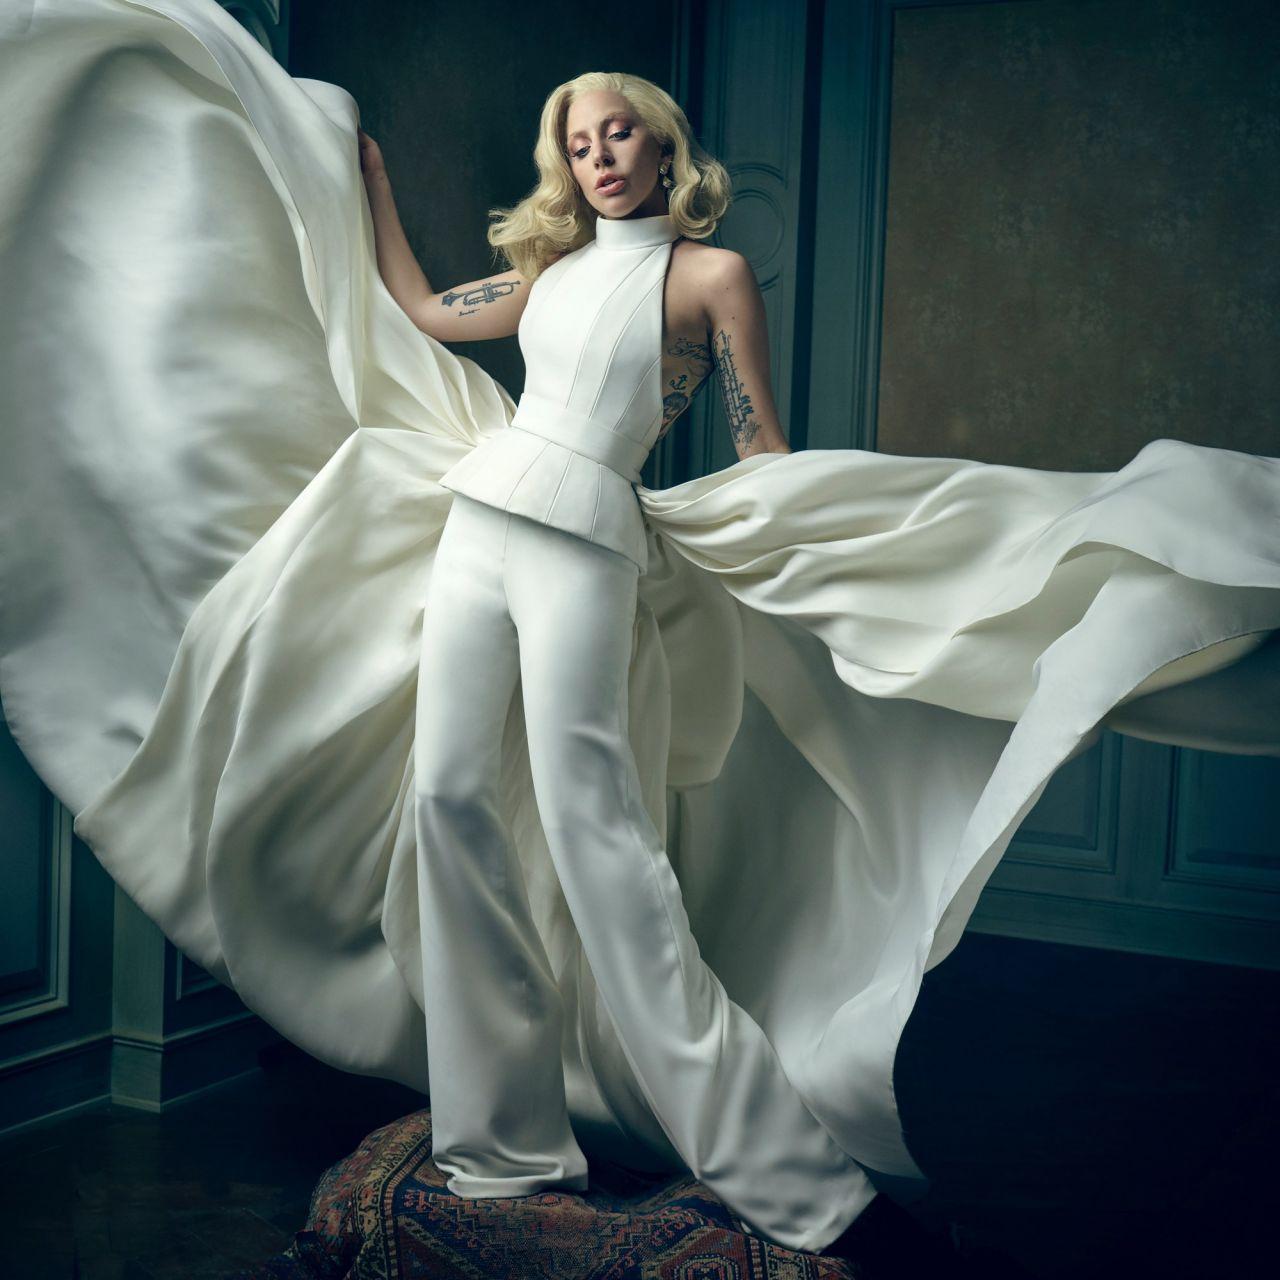 Lady Gaga 2016 Vanity Fair Oscar Party Portrait Celebmafia